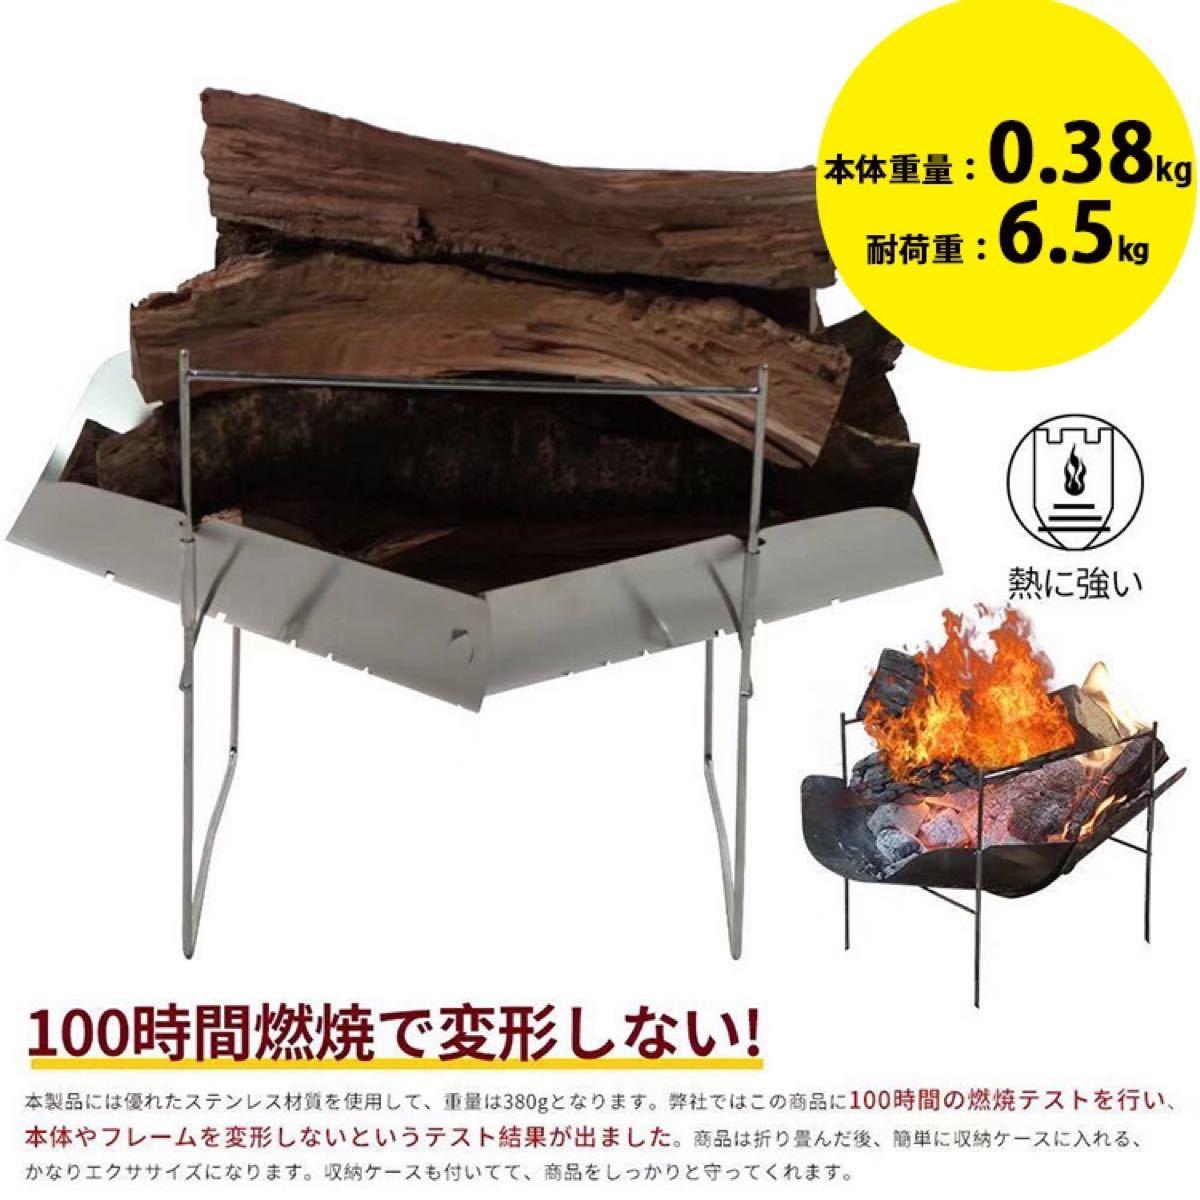 Soomloom正規品 焚き火台 ソロキャンプ バーベキューコンロ 焚火台